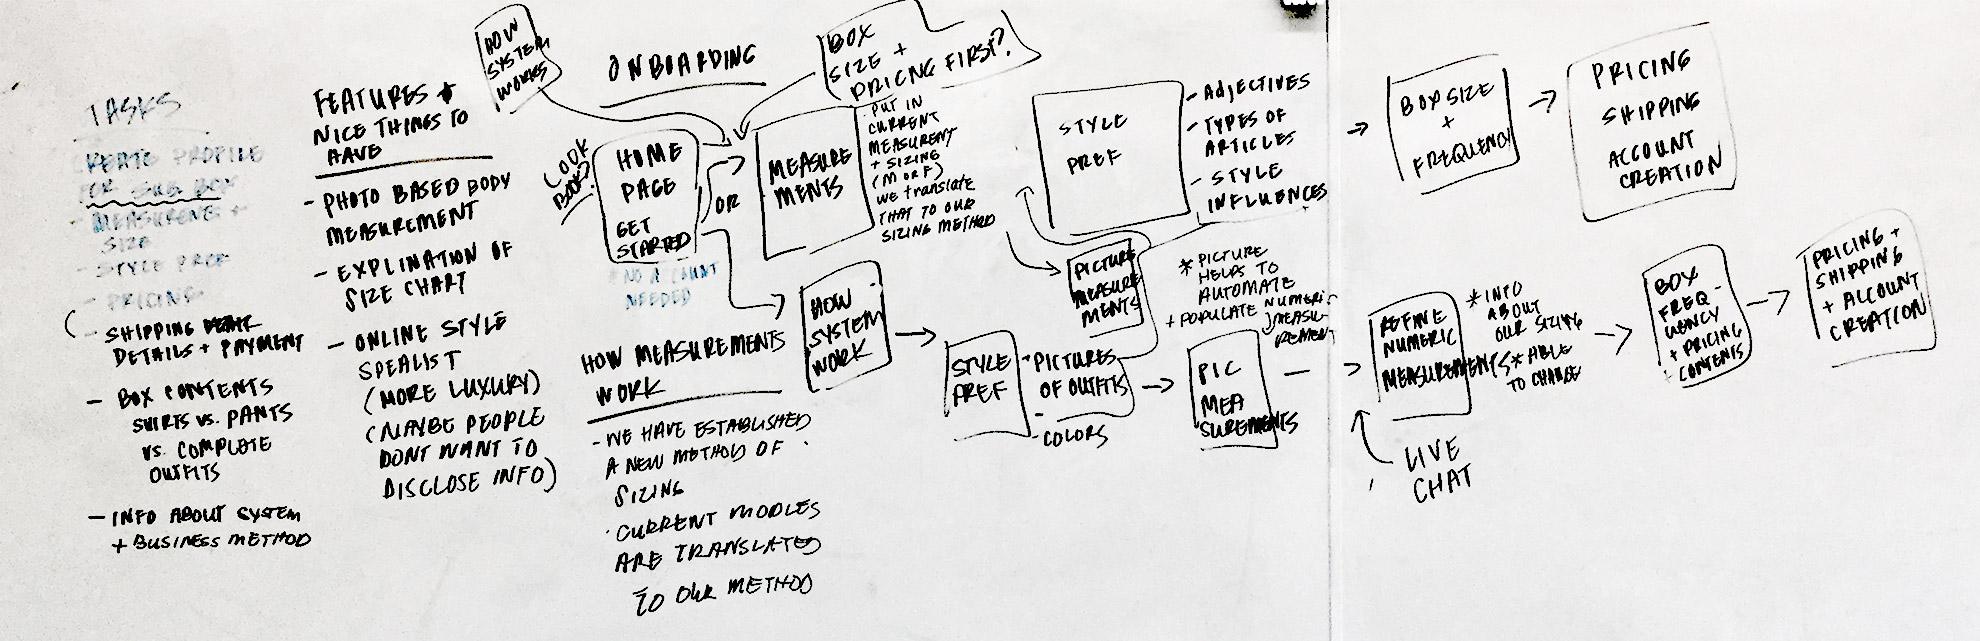 accountcreation-whiteboarding